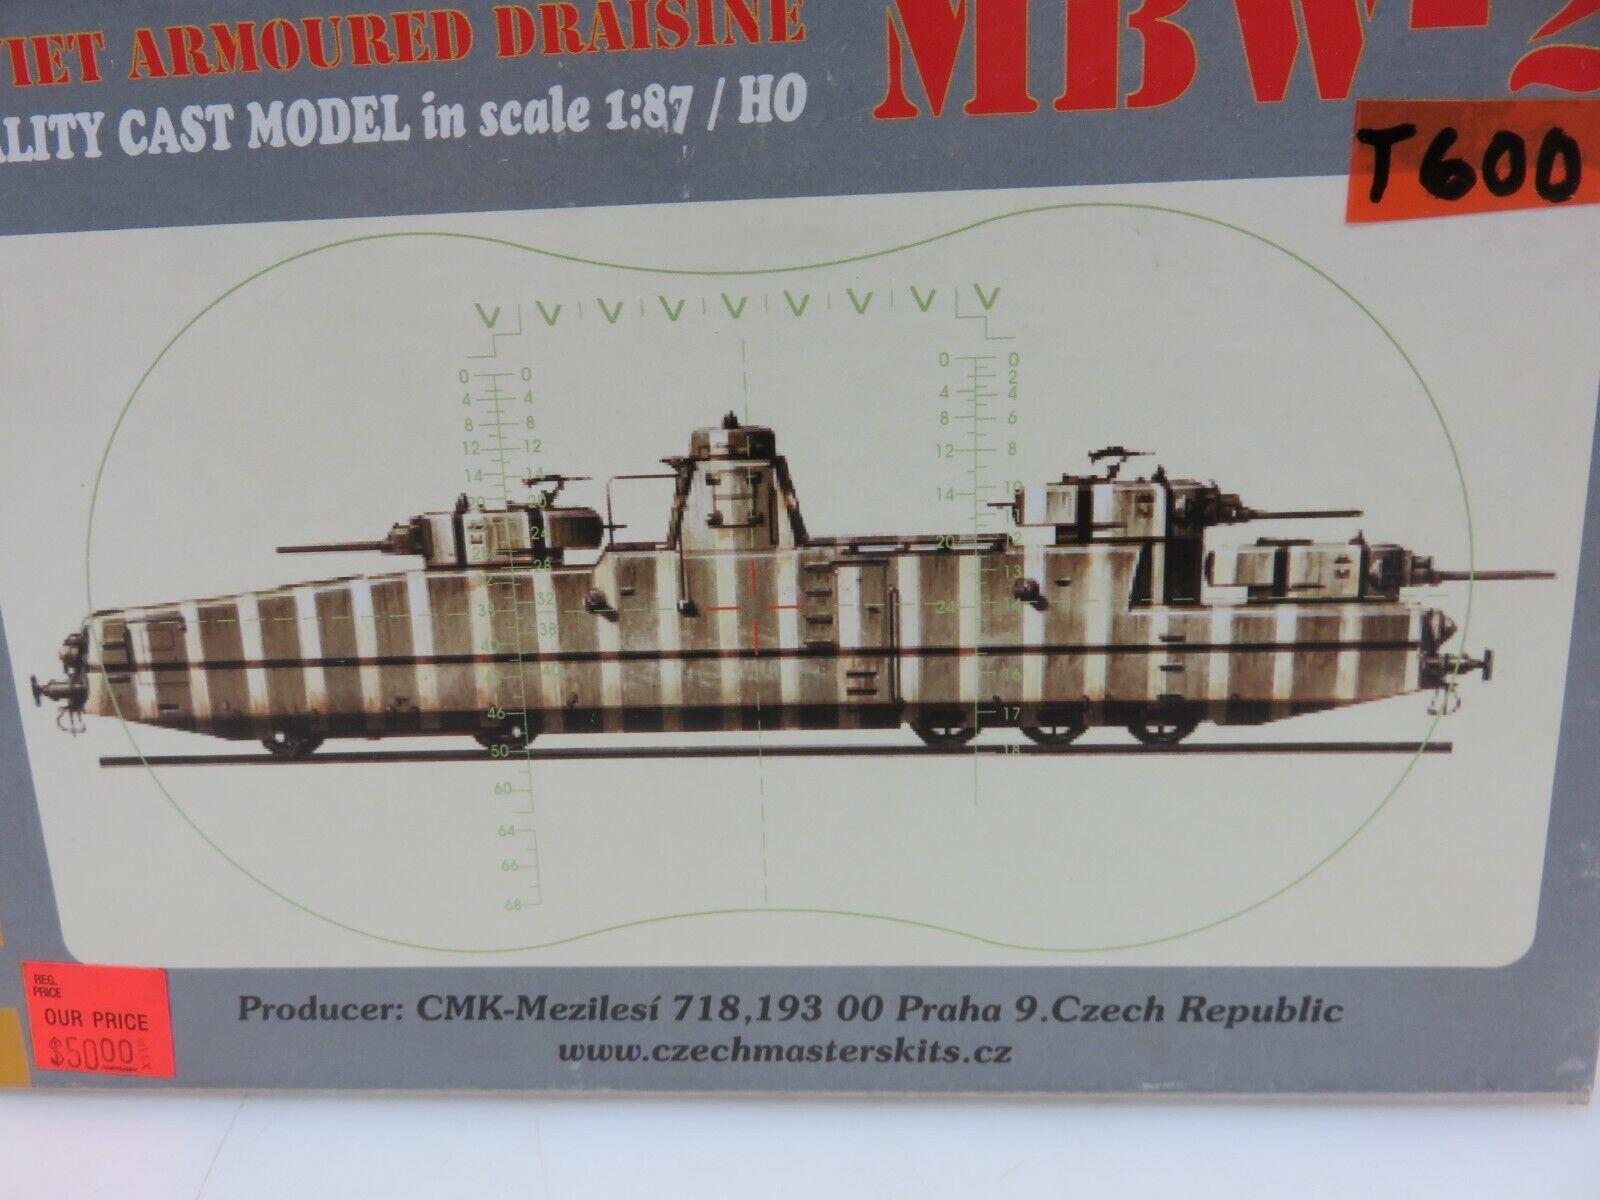 Czech Master MBW2 sovietica corazzata Draisina HO Kit modellolino in scala 187 R001 AMMINI